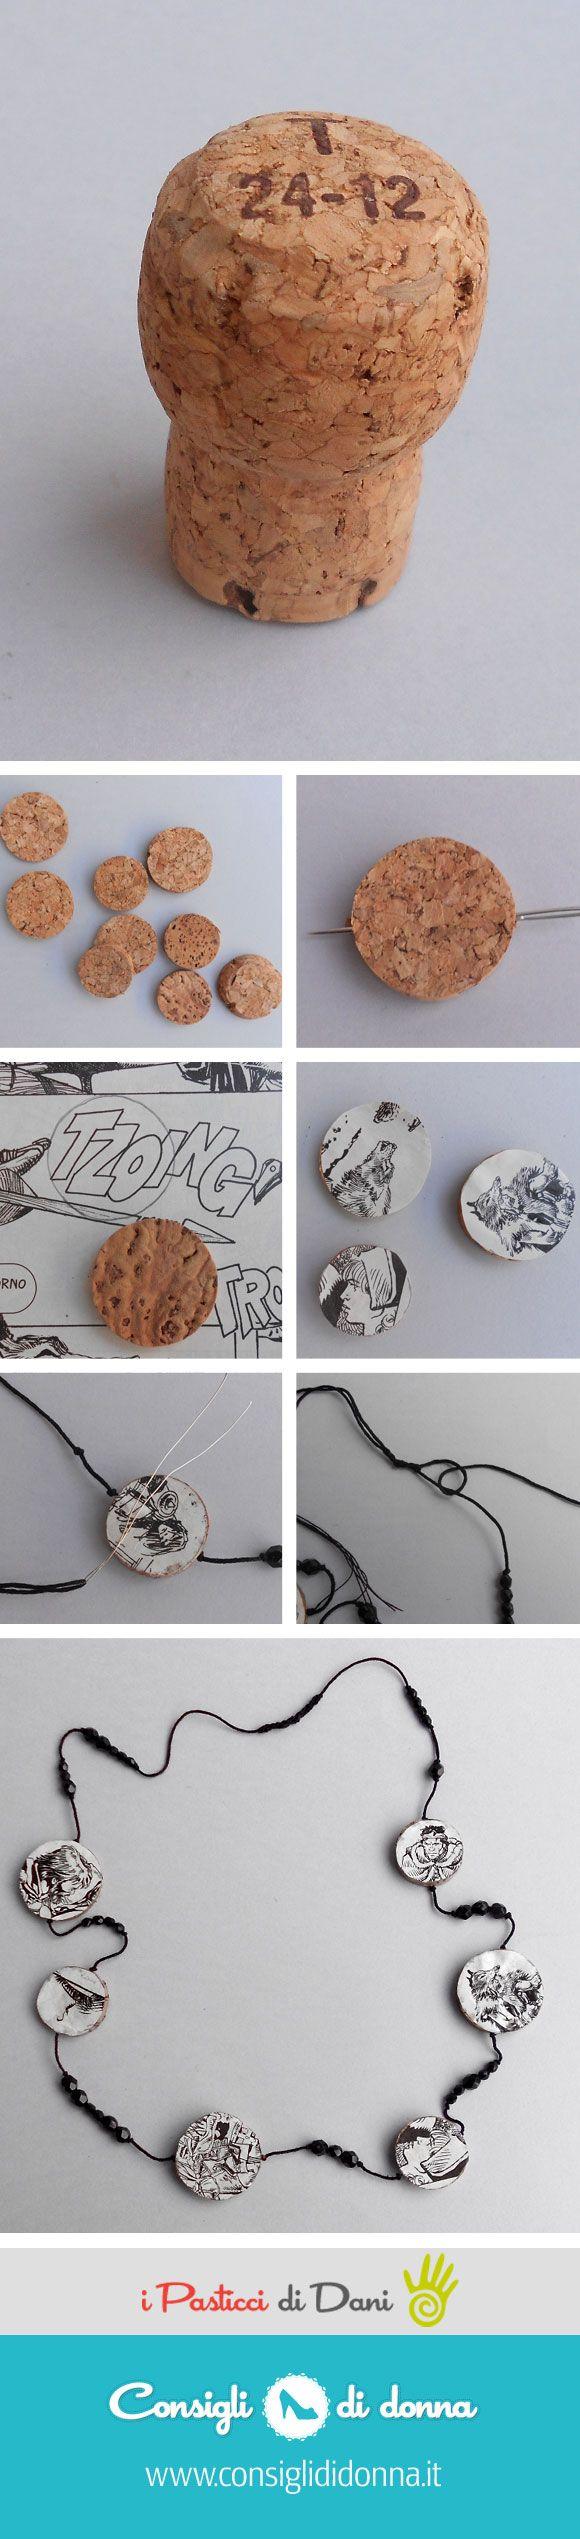 comics necklace